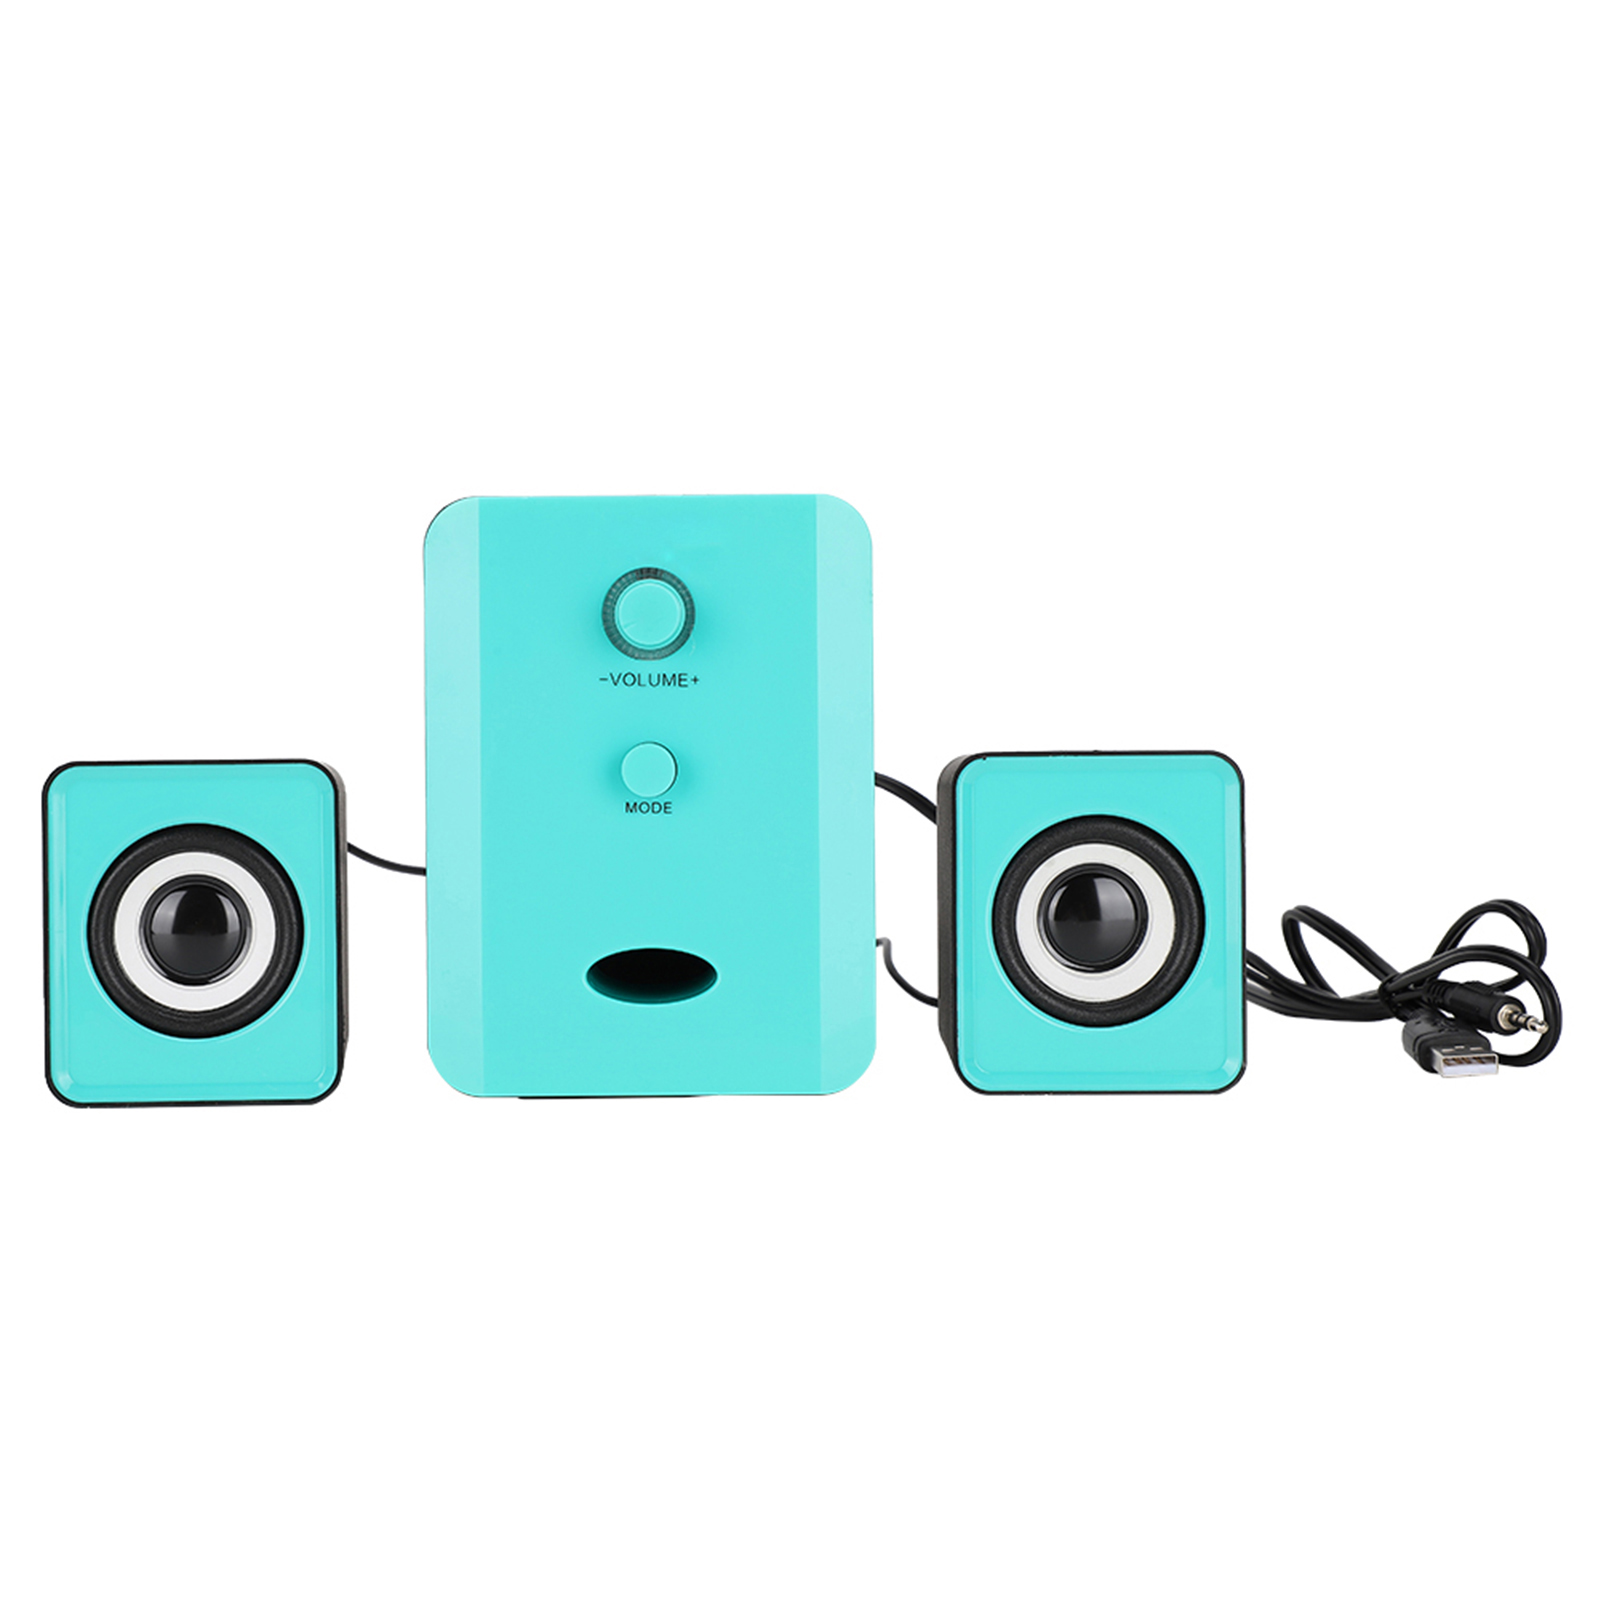 SADA-Bluetooth-Computer-Speaker-Desktop-Laptop-PC-Stereo-Subwoofer-Multimedia thumbnail 91